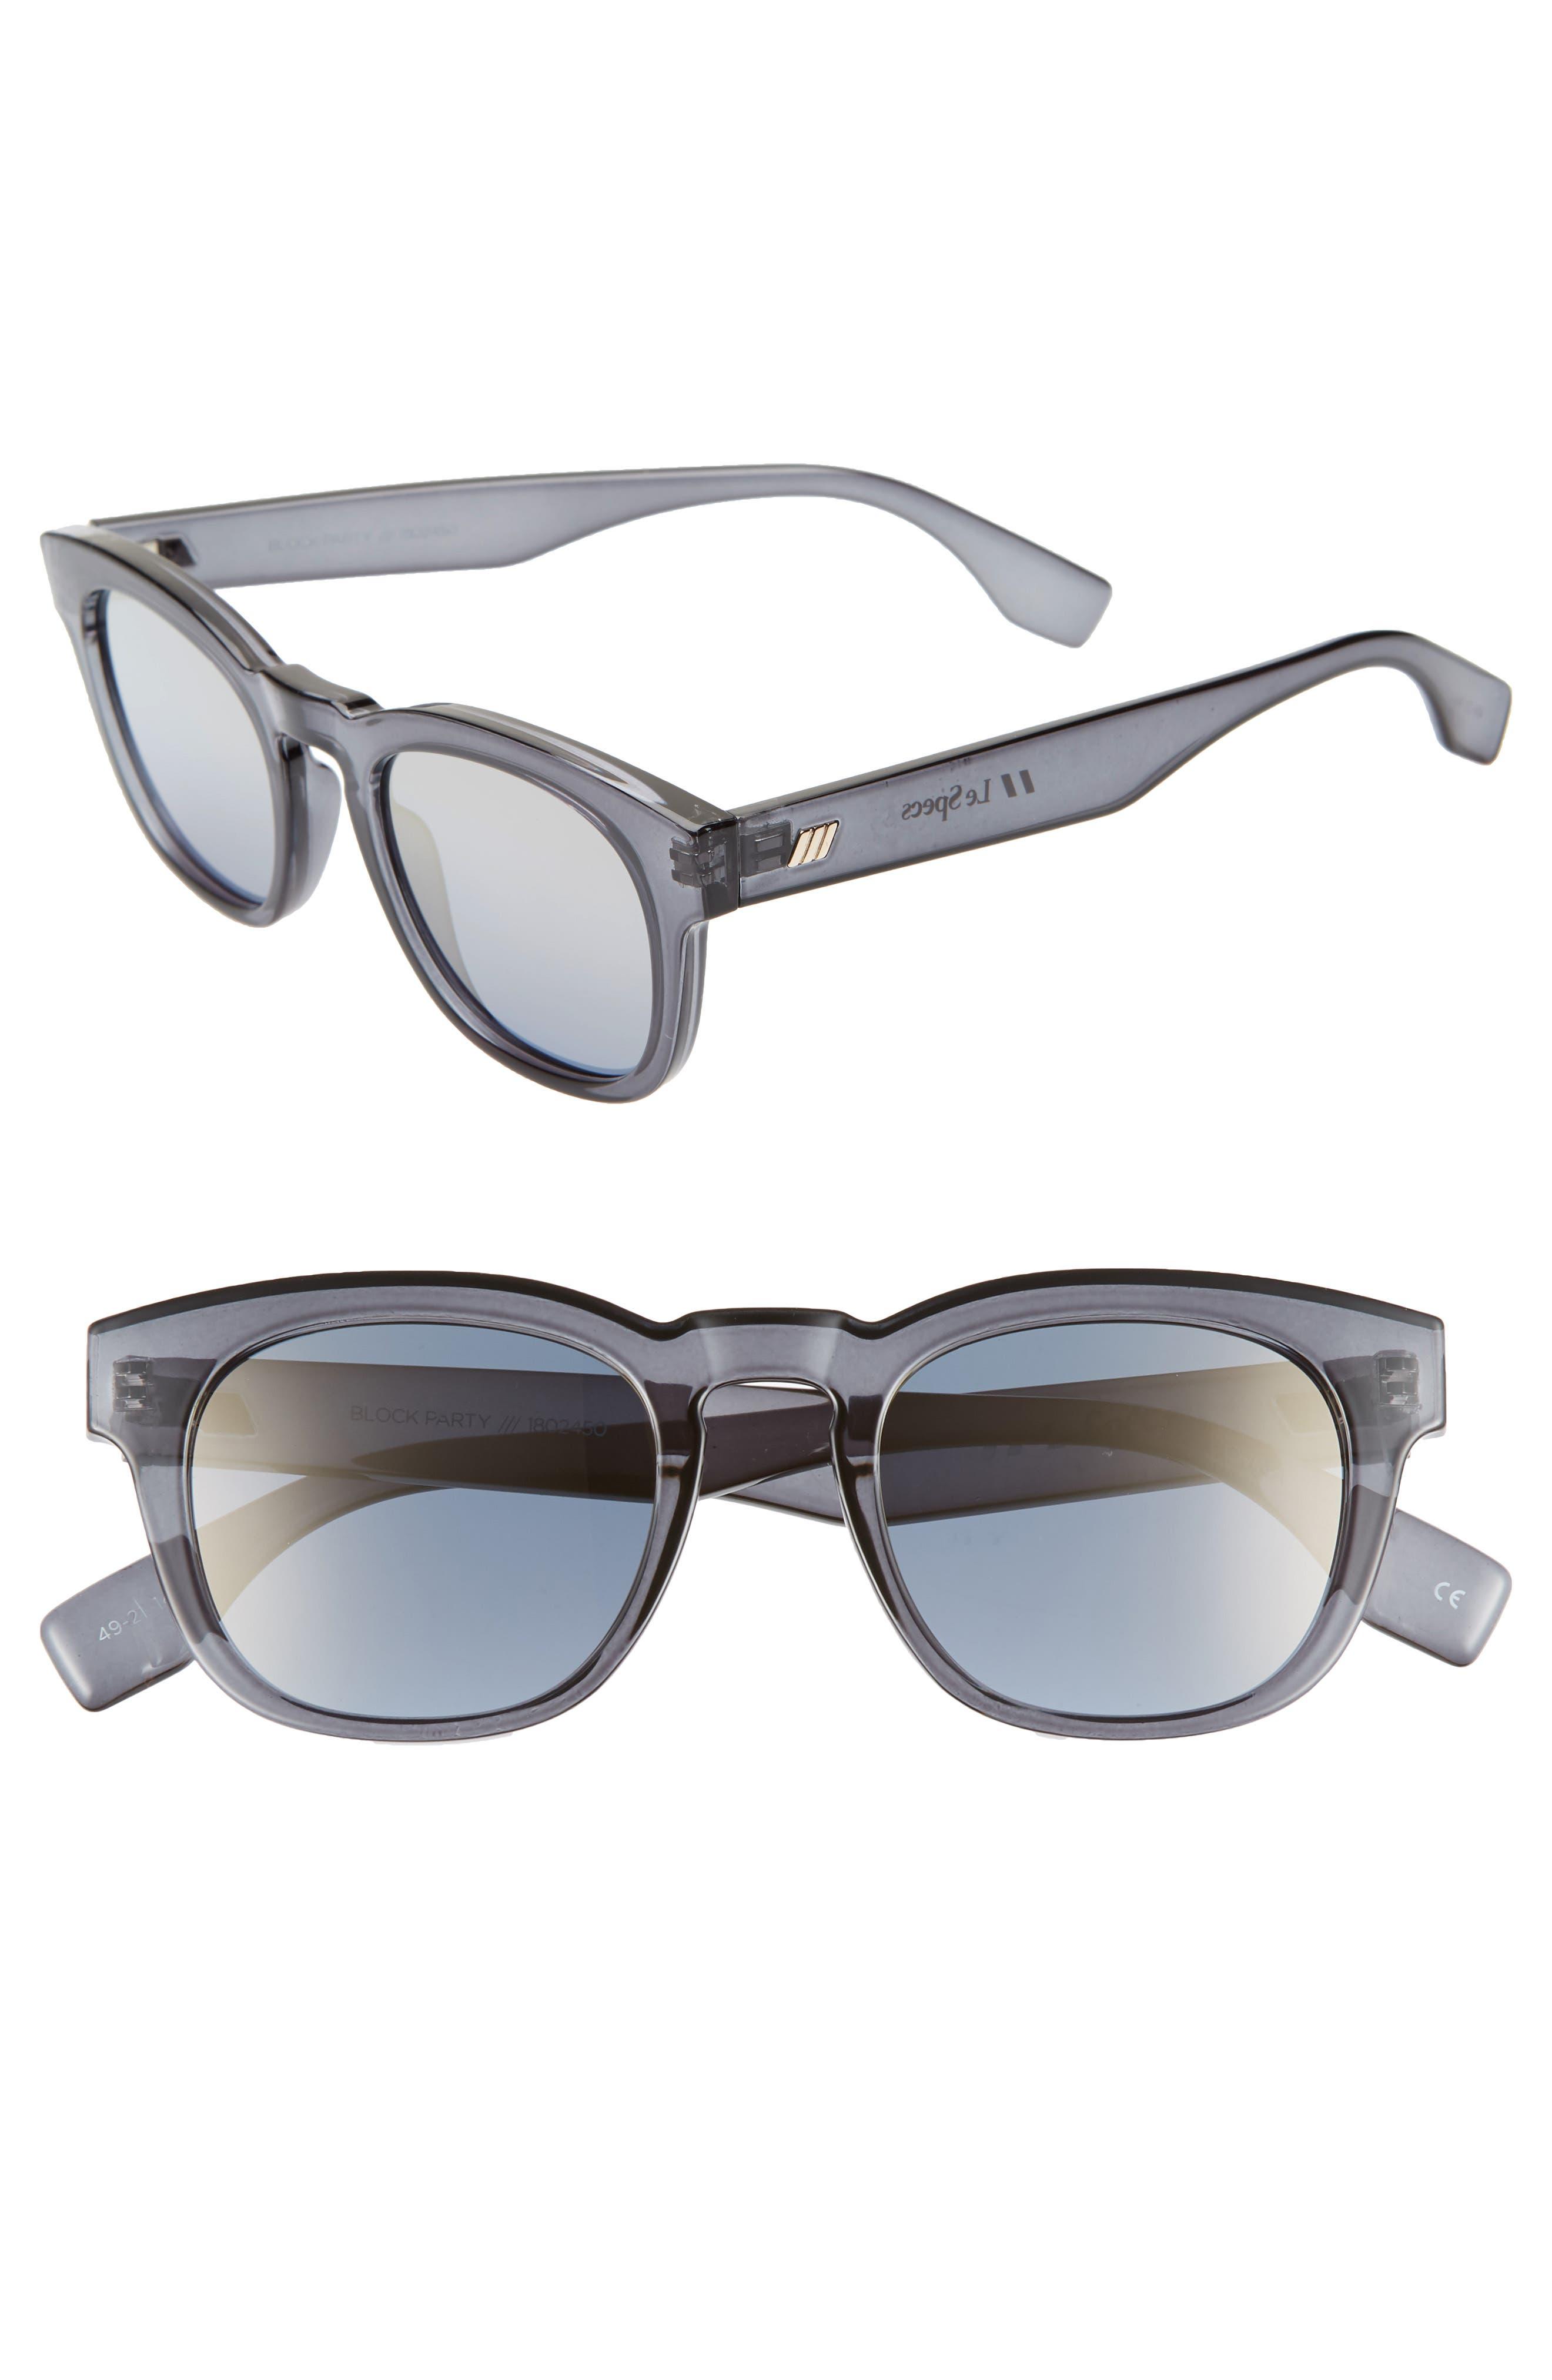 Le Specs Block Party 4m Round Sunglasses - Slate